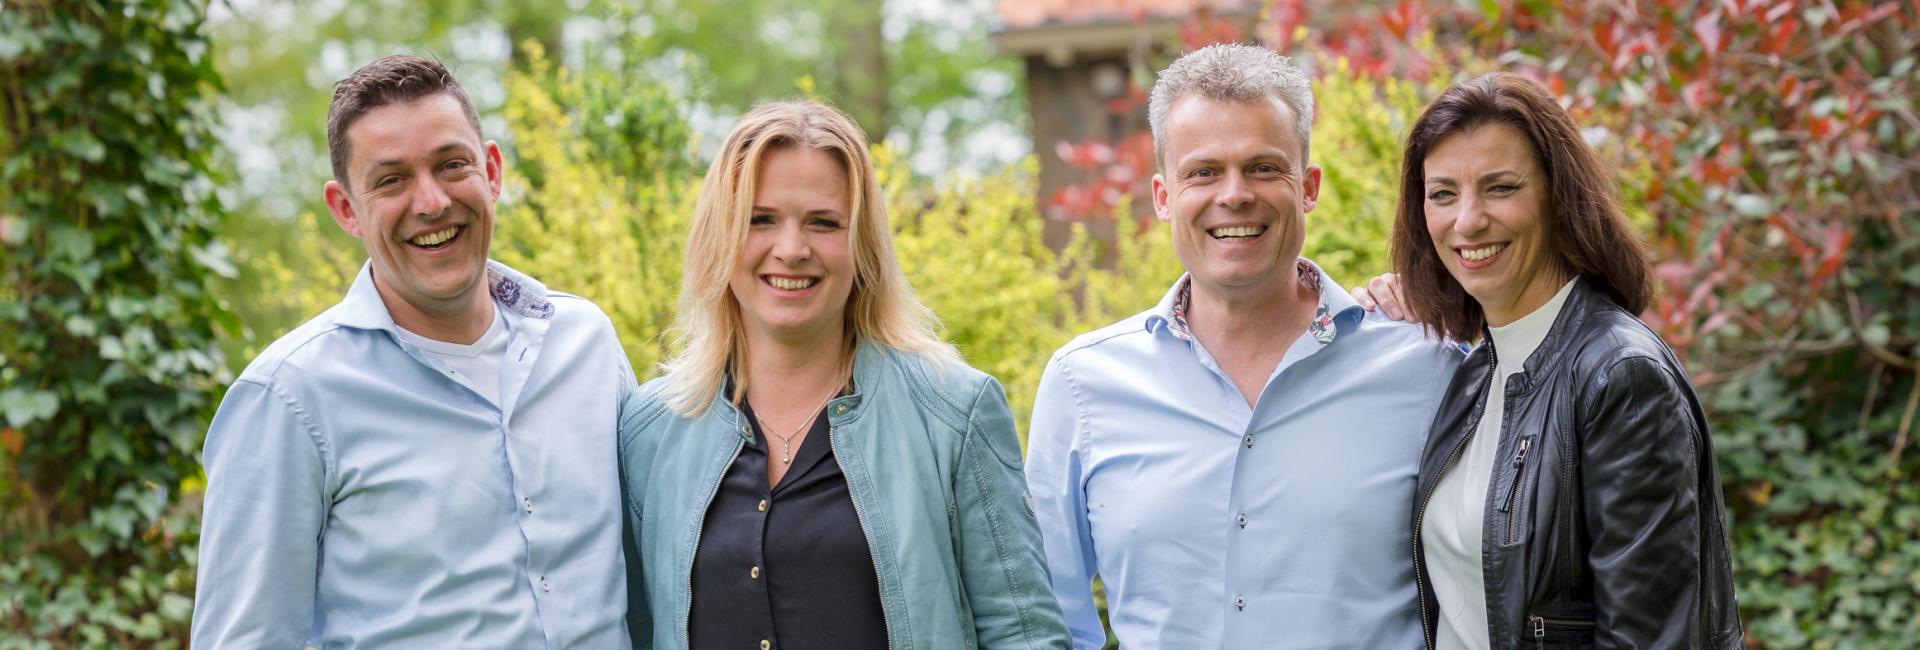 De Friese Ardennen Sieto van Houten Karin van Houten Aafke Sinnige Paul Sinnige